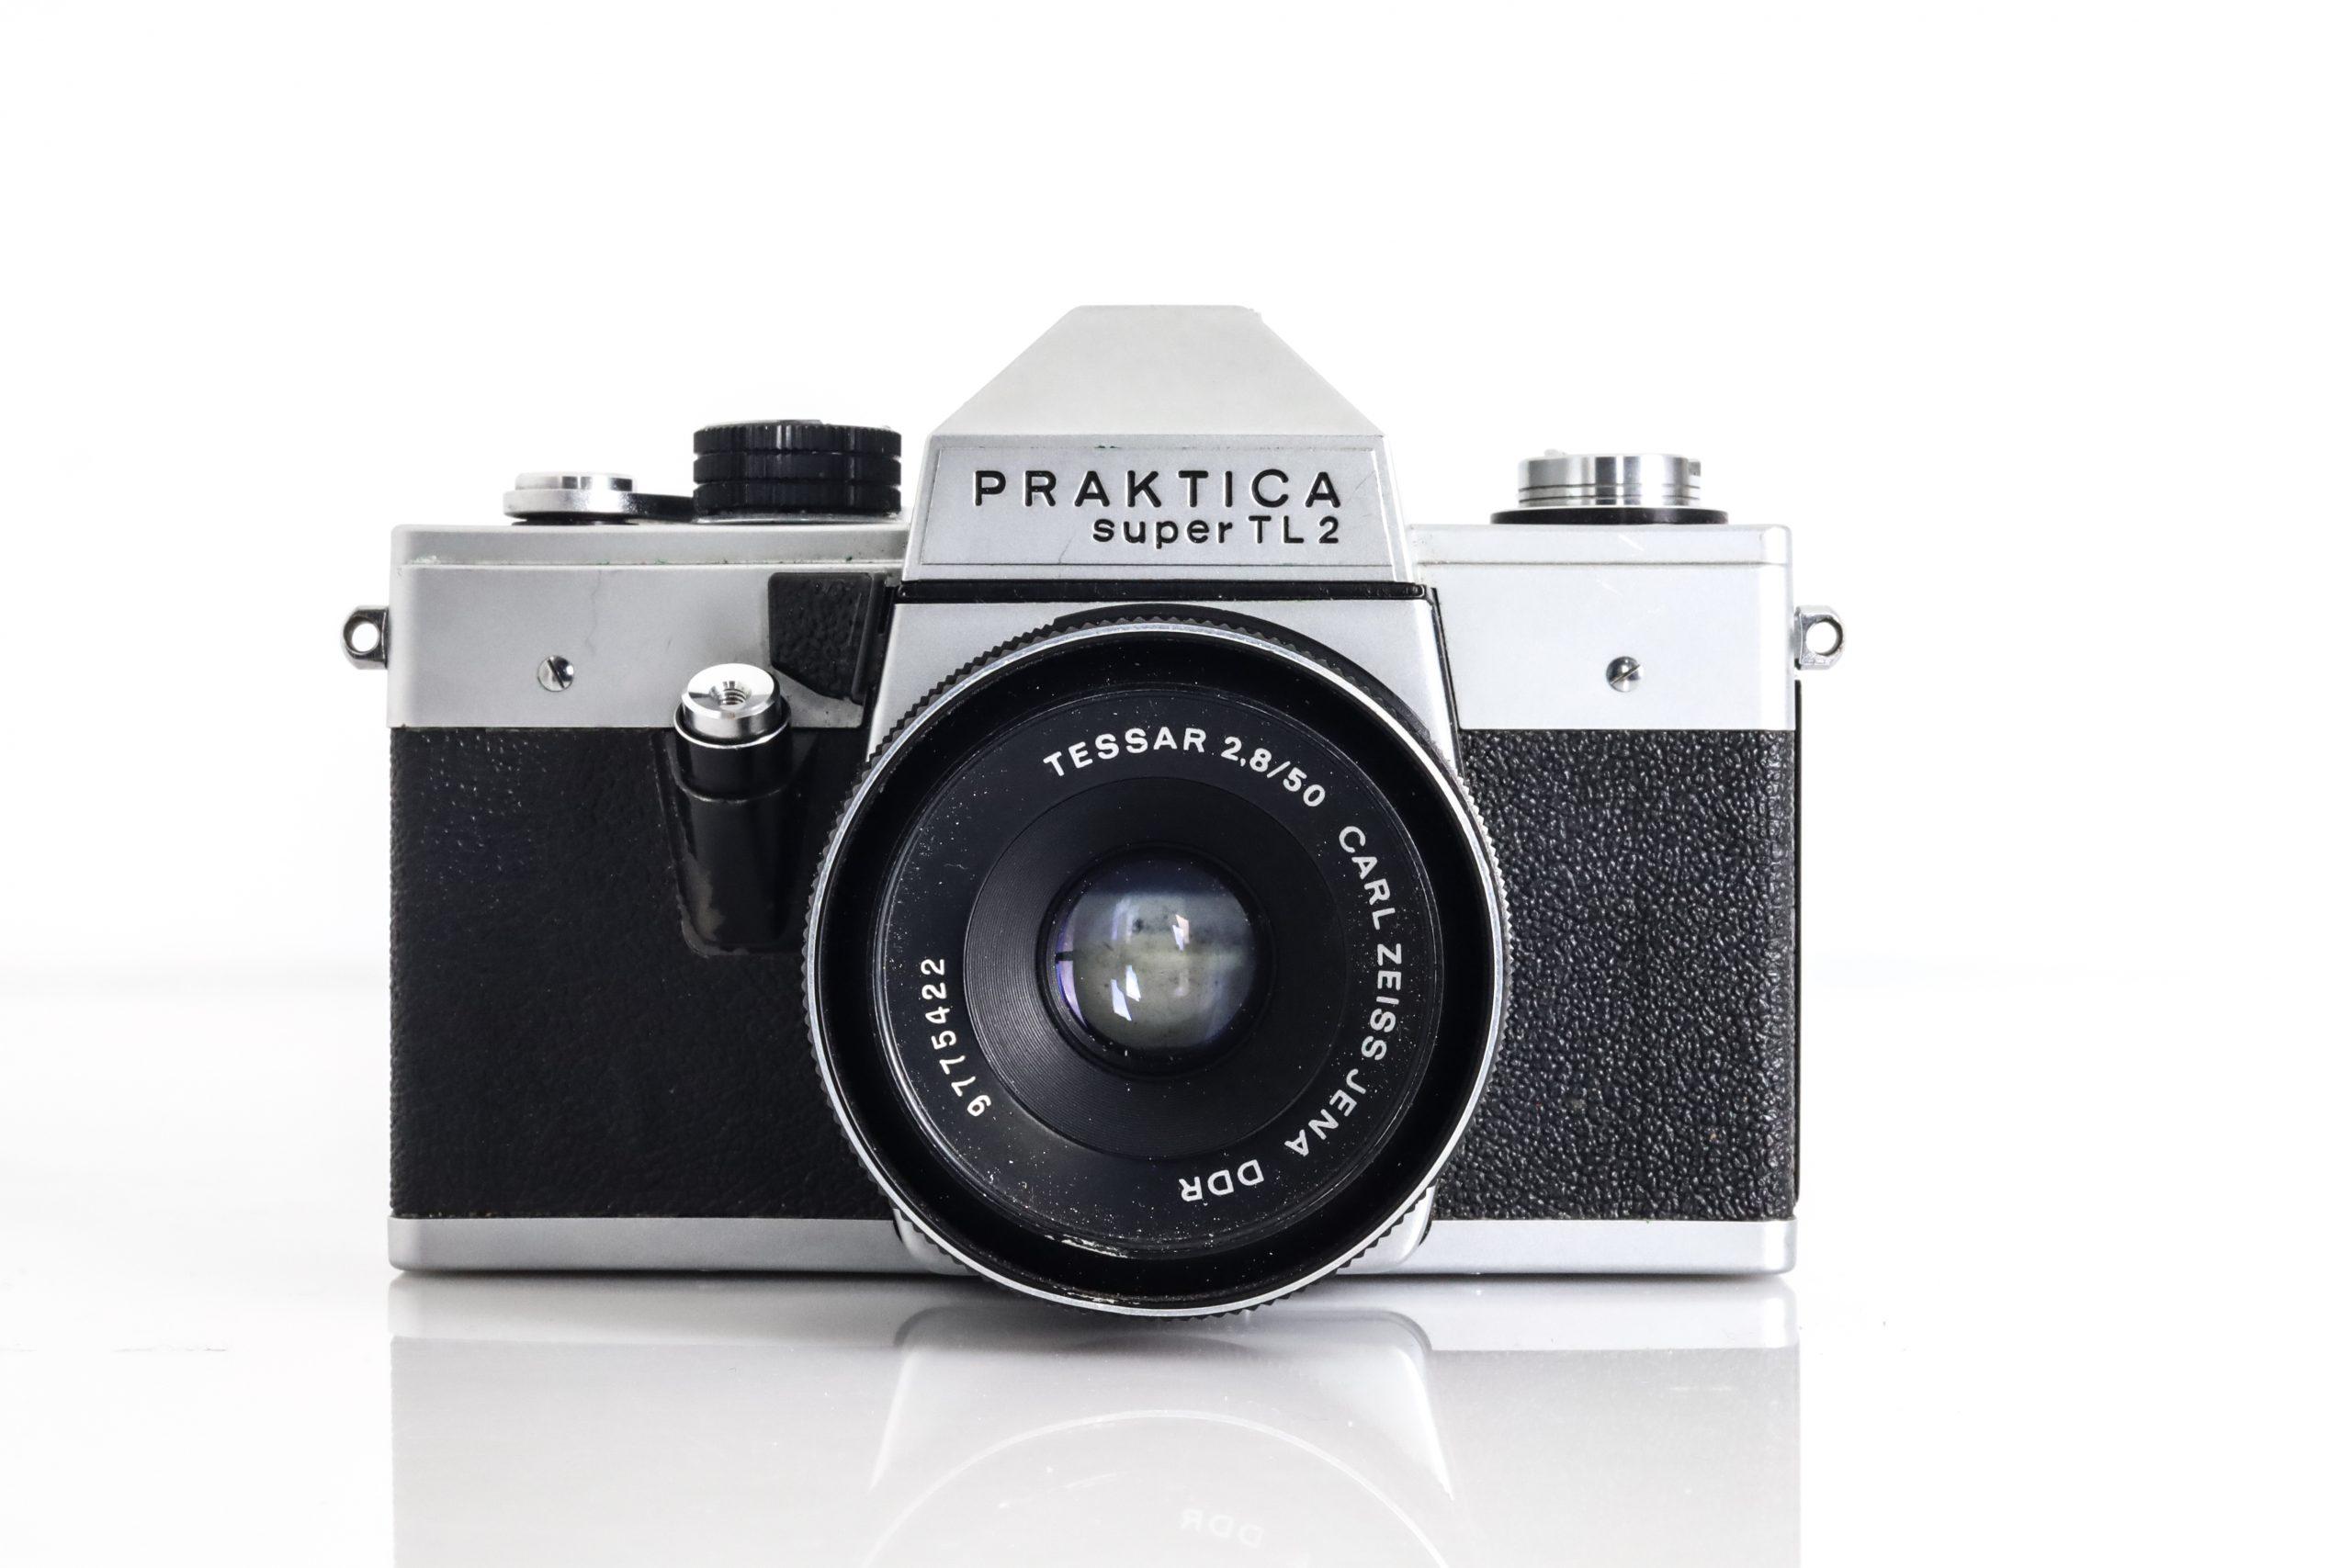 Praktica Super TL2 with Faulty Carl Zeiss Jena DDR 50mm F2.8 Lens